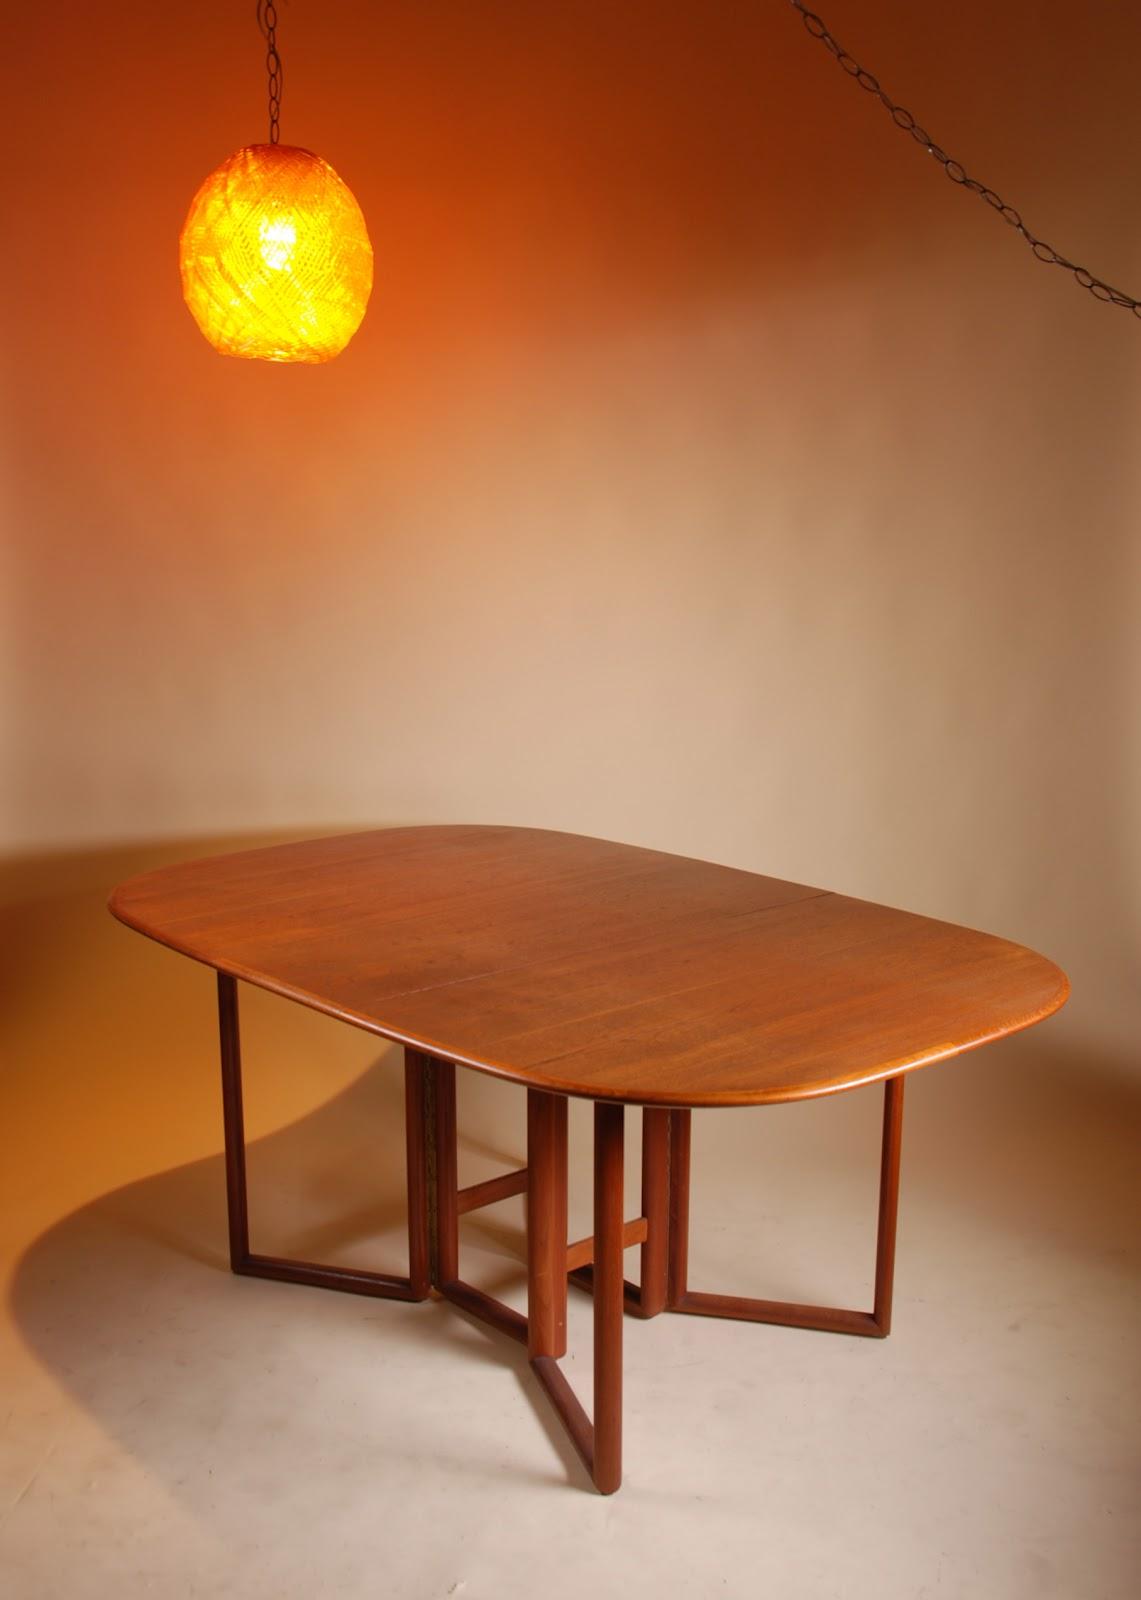 Mid Century Modern Ceiling Light Fixture: *: Mid Century Modern Oval Folding Dining Table